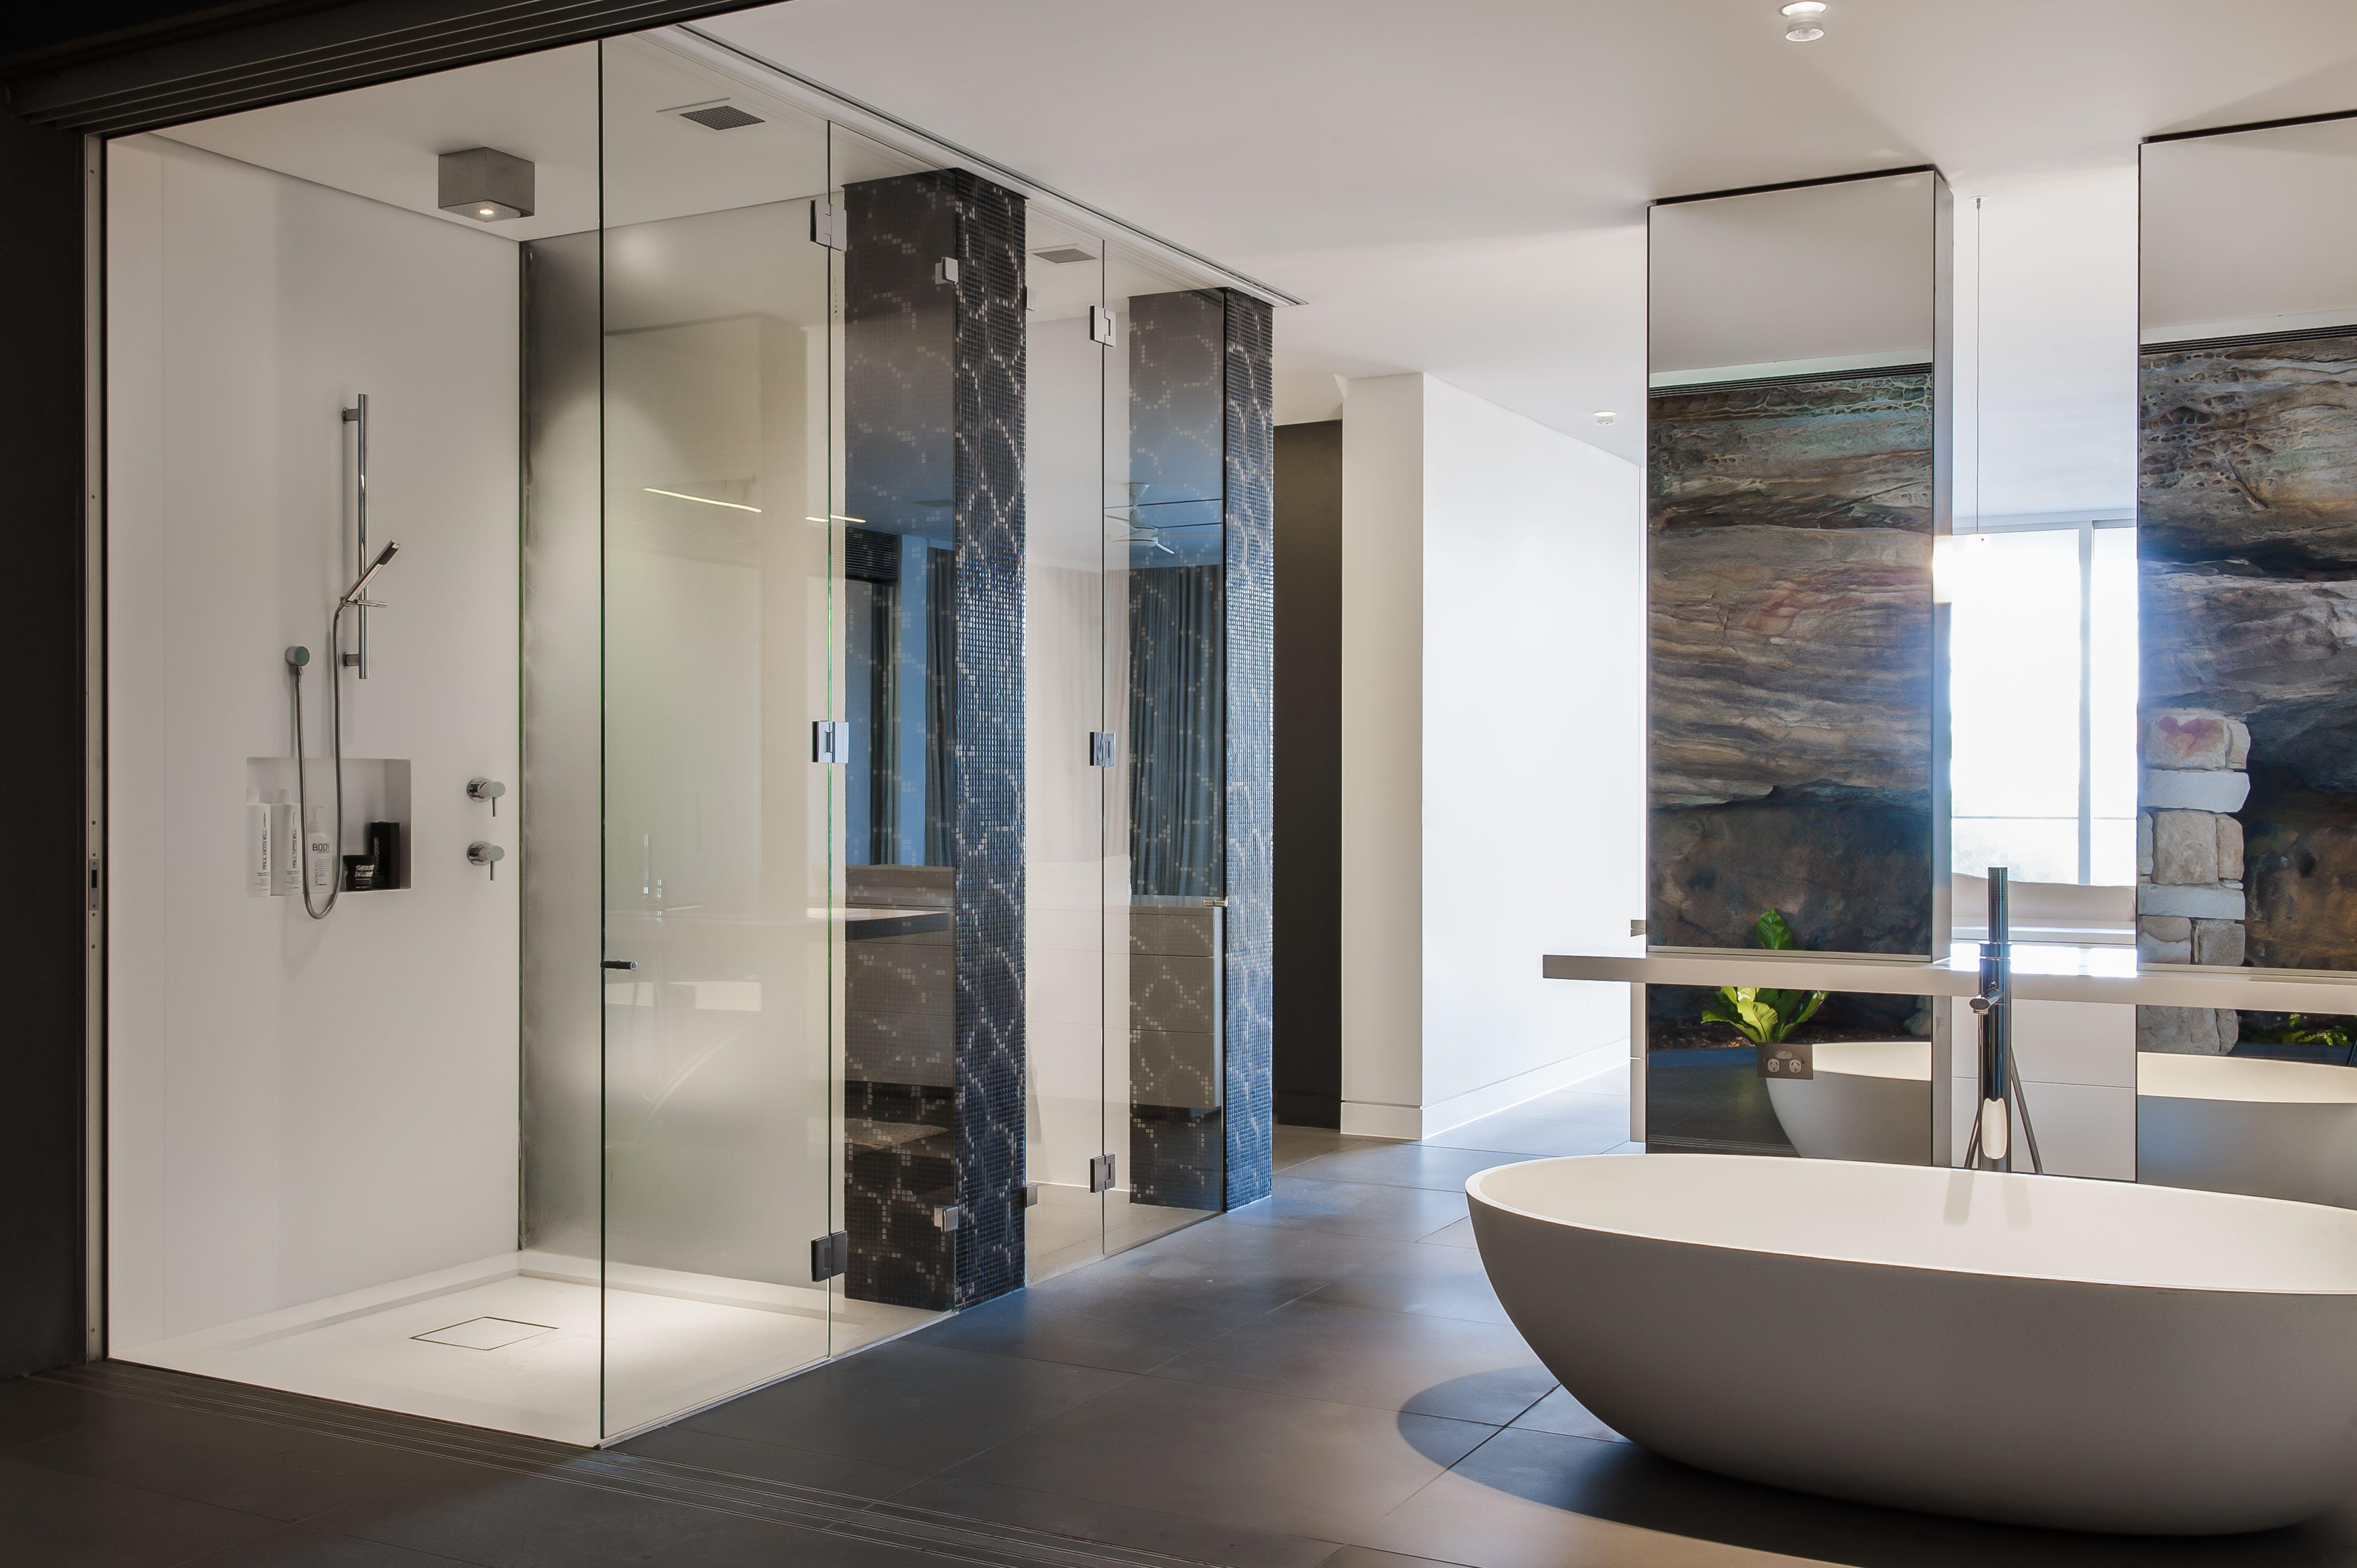 Designer Bathrooms 2014 Bathroom Ideas Designer Bathrooms  Home Stunning Top Bathroom Designs Inspiration